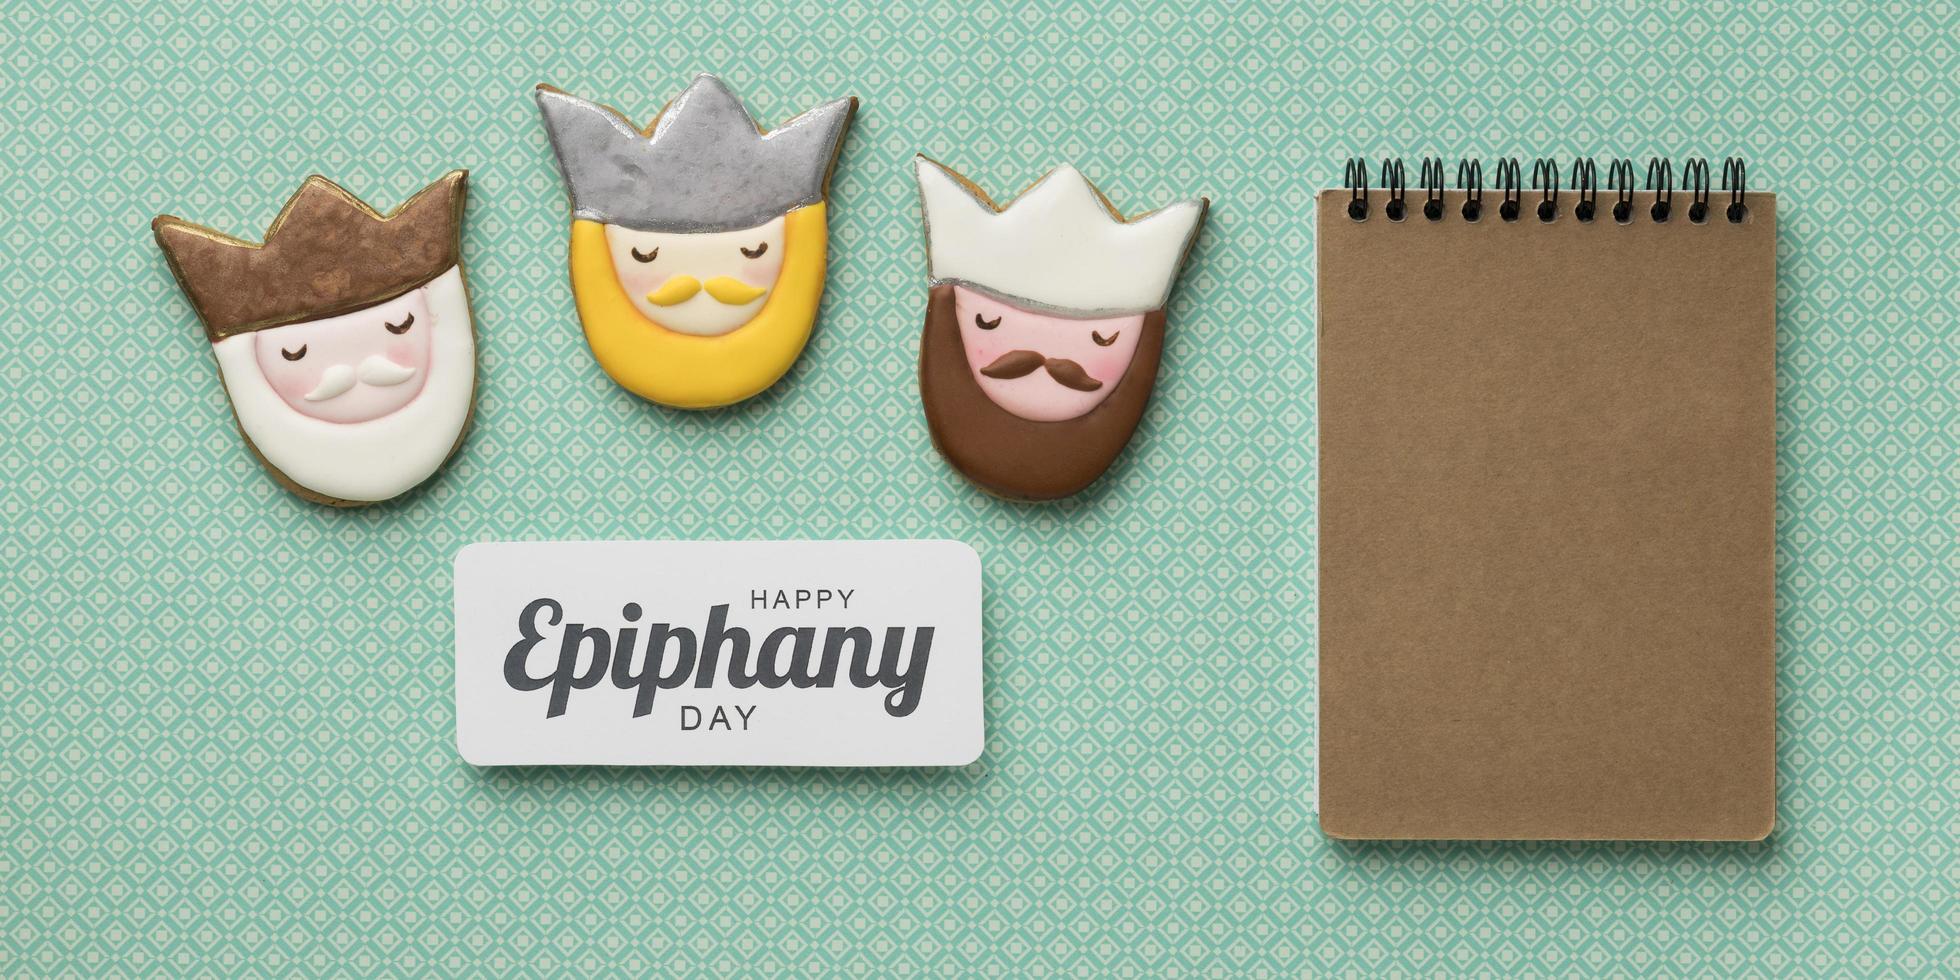 epiphany day cookies met blocnote foto